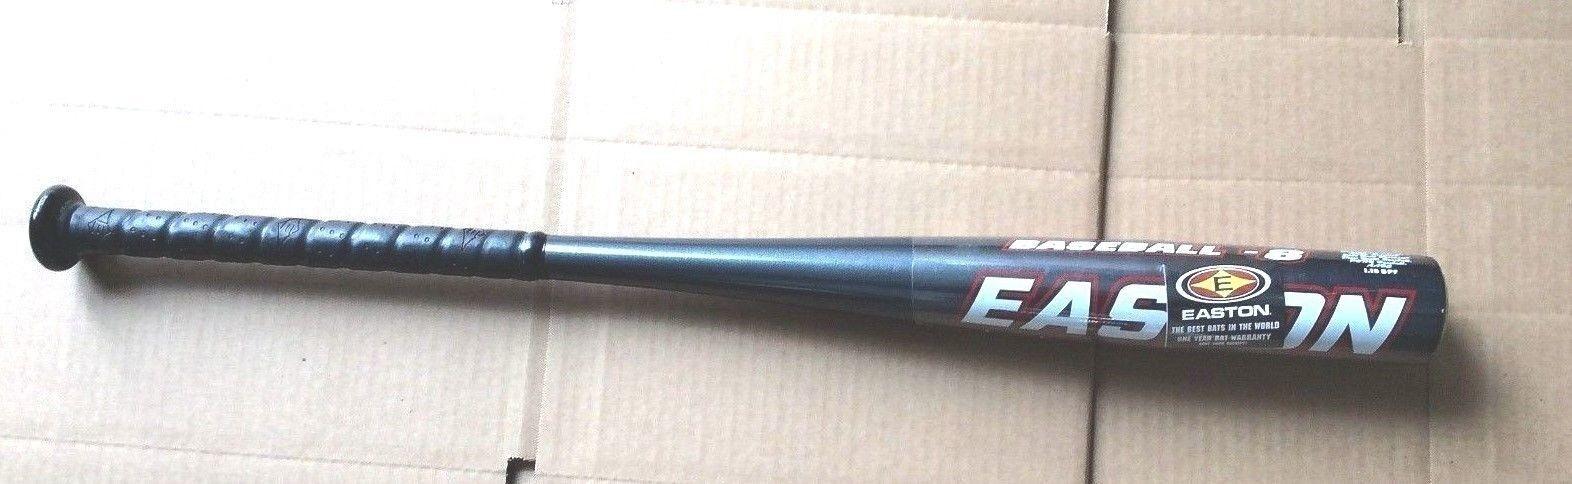 Easton Magnum LK2 Baseball Bat 29  21oz. 2 1 4  Barrell Diameter BRAND NEW